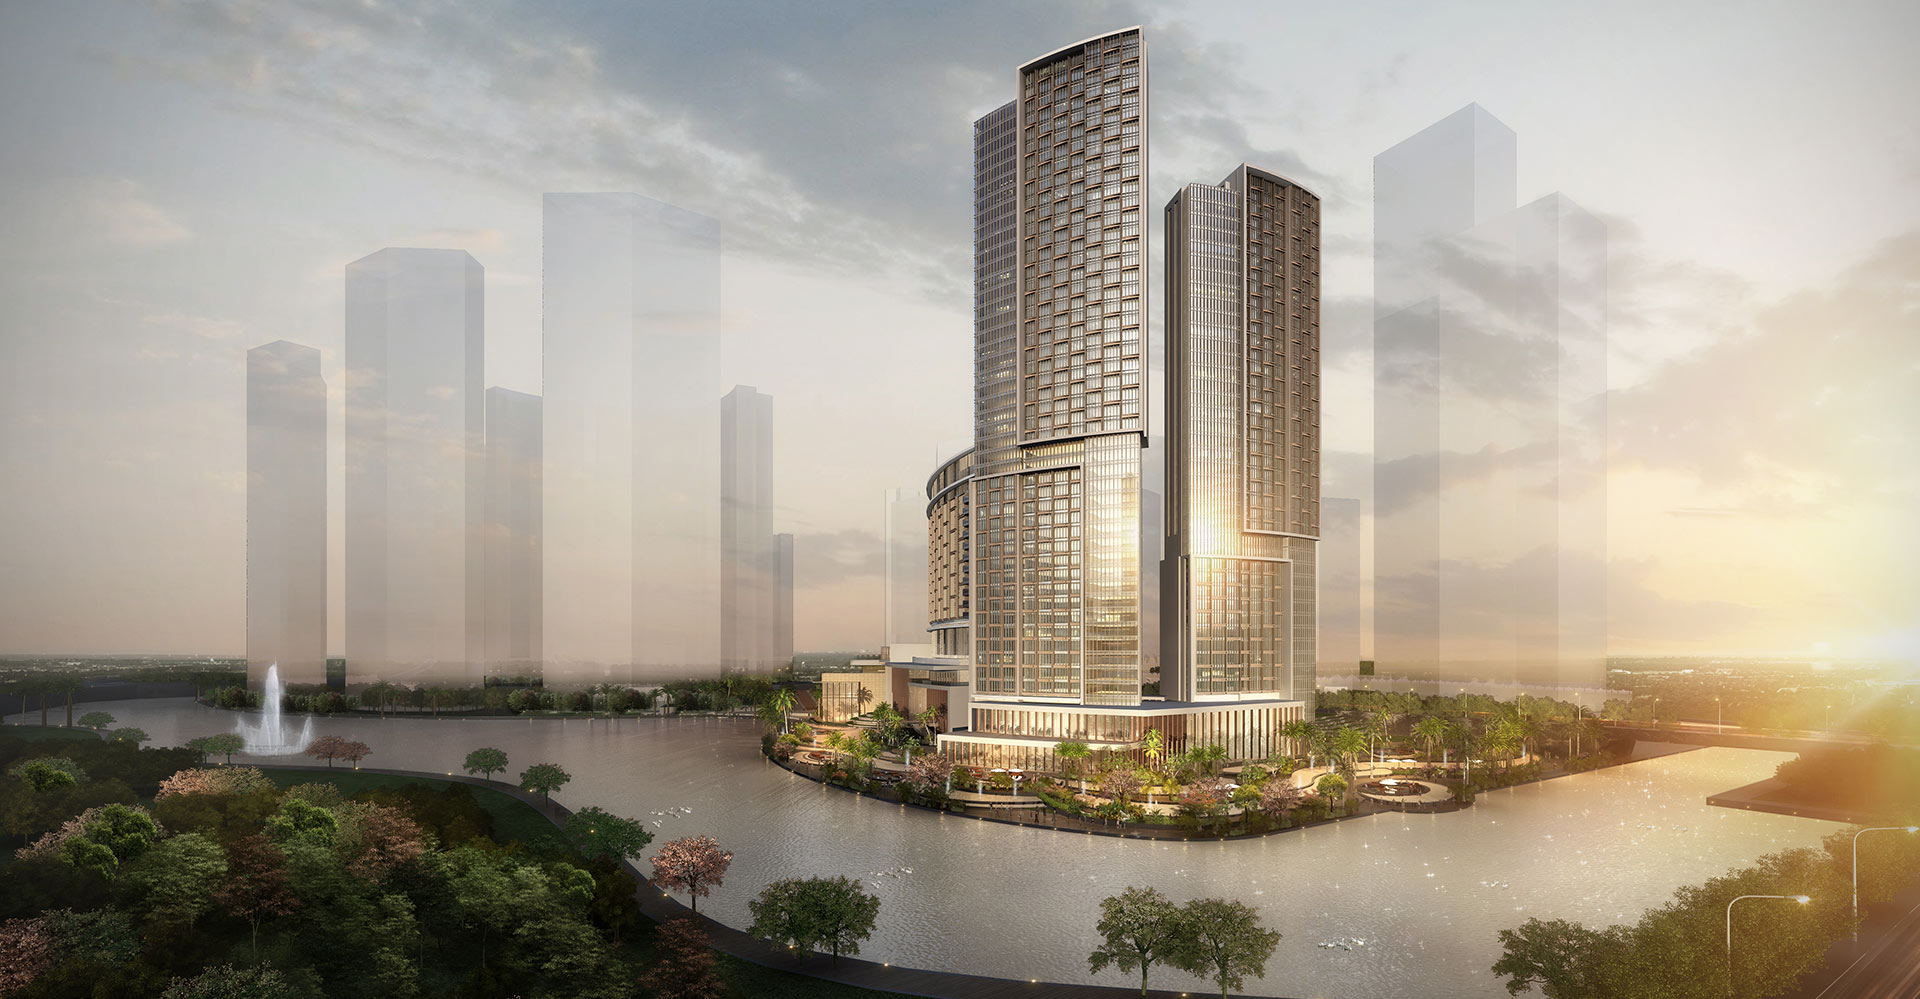 Chengdu Mixed-Use Development and Hyatt Regency Exterior 2